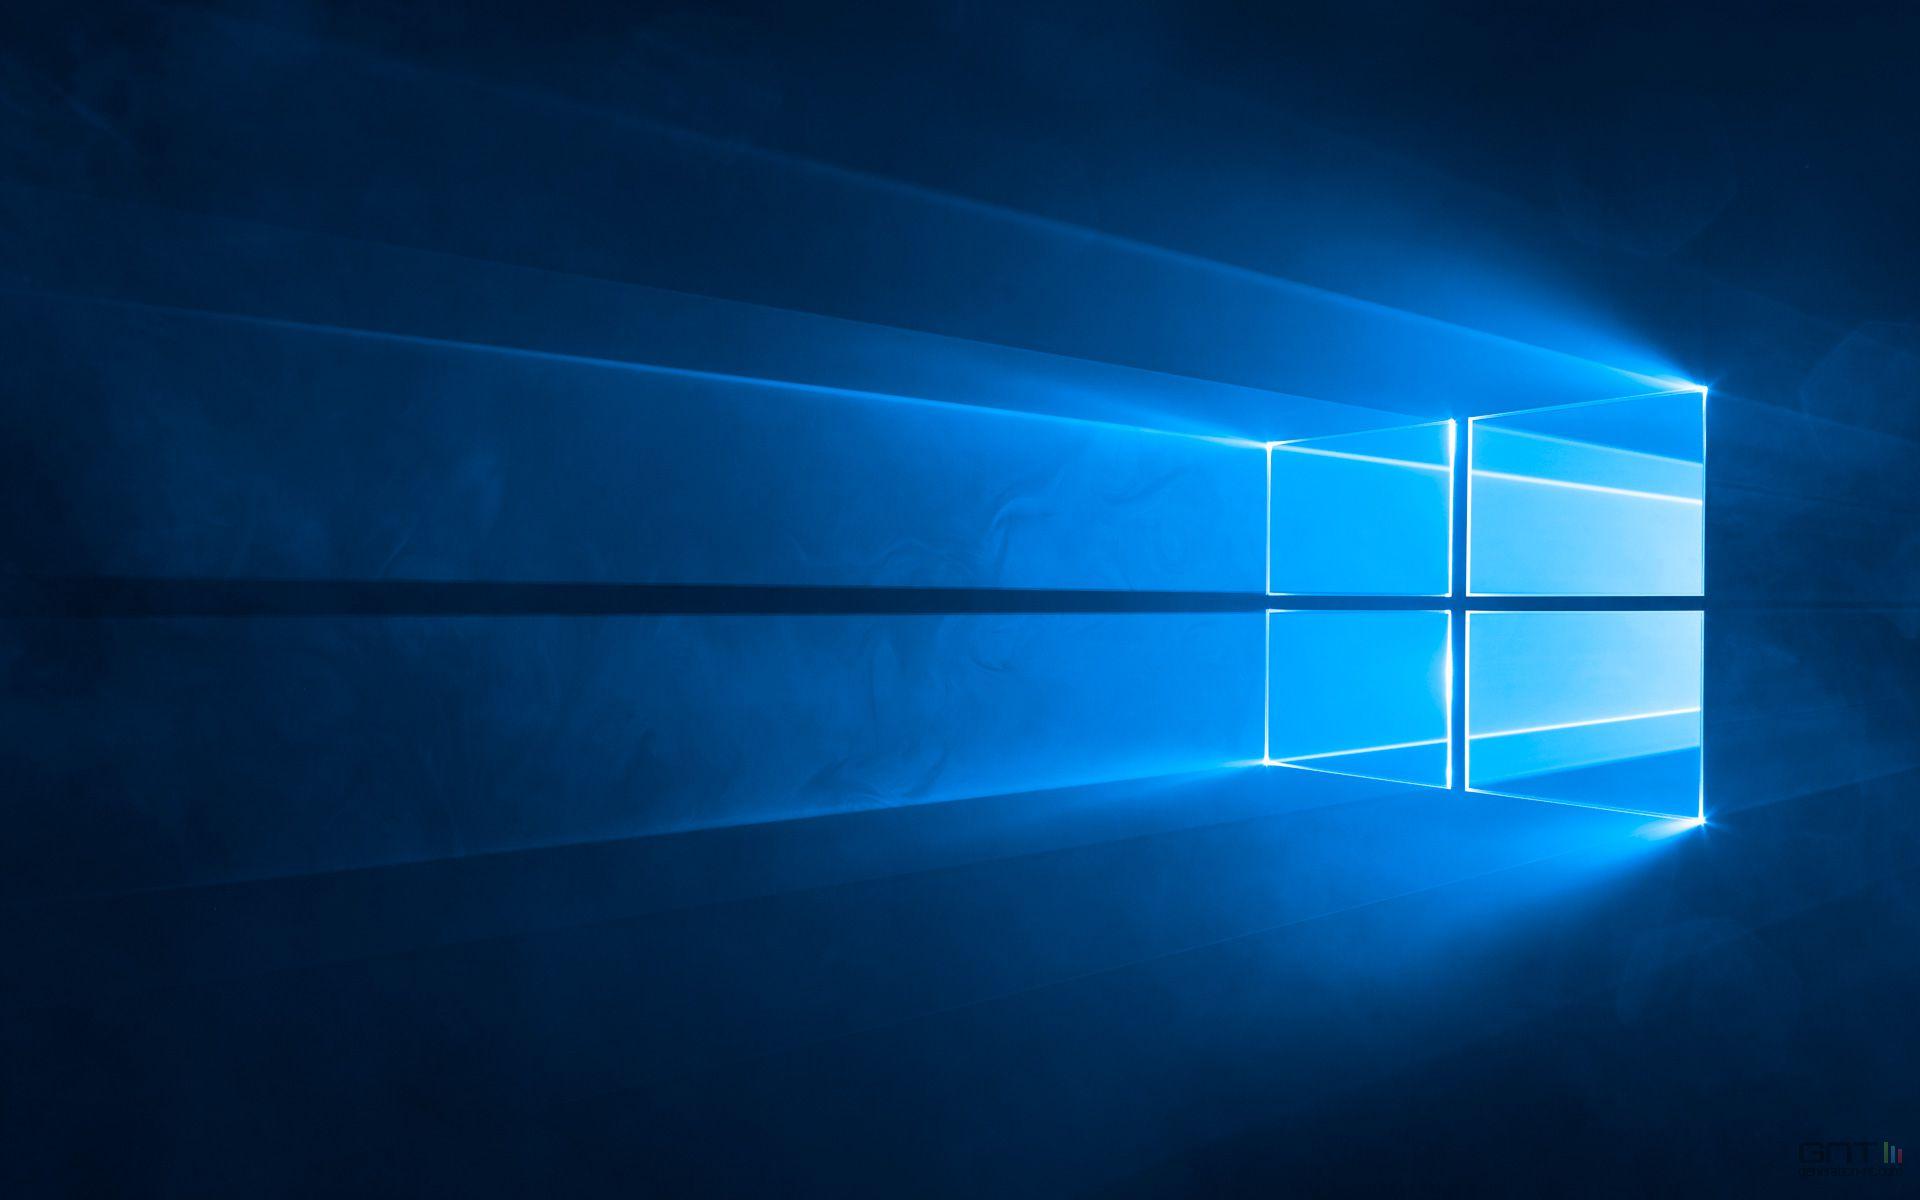 windows 10 fond ecran